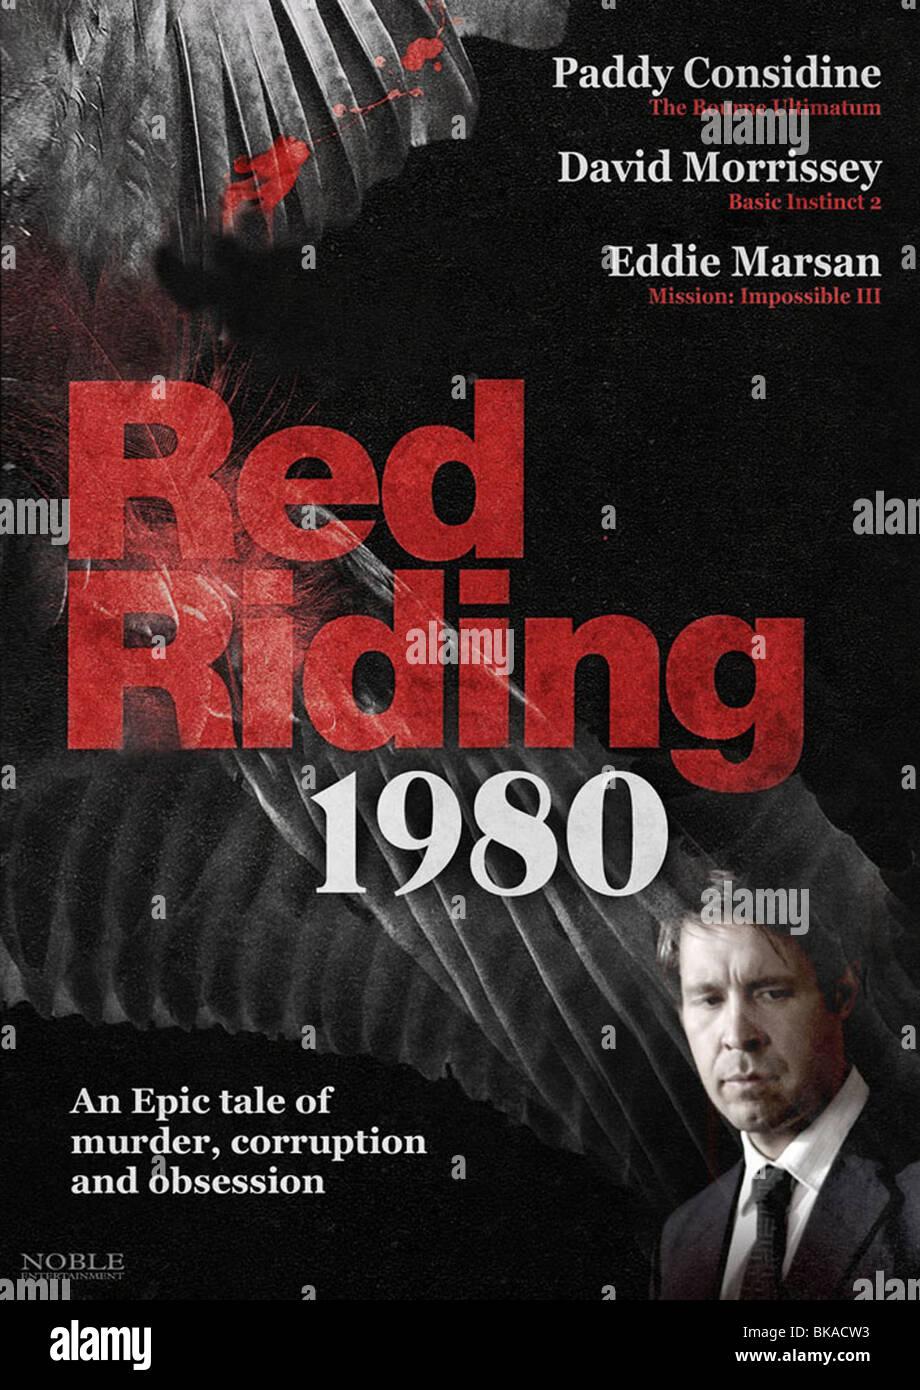 Caballo Rojo: 1980 Año : 2009 Director : británico James Marsh carteles de cine (UK) Imagen De Stock